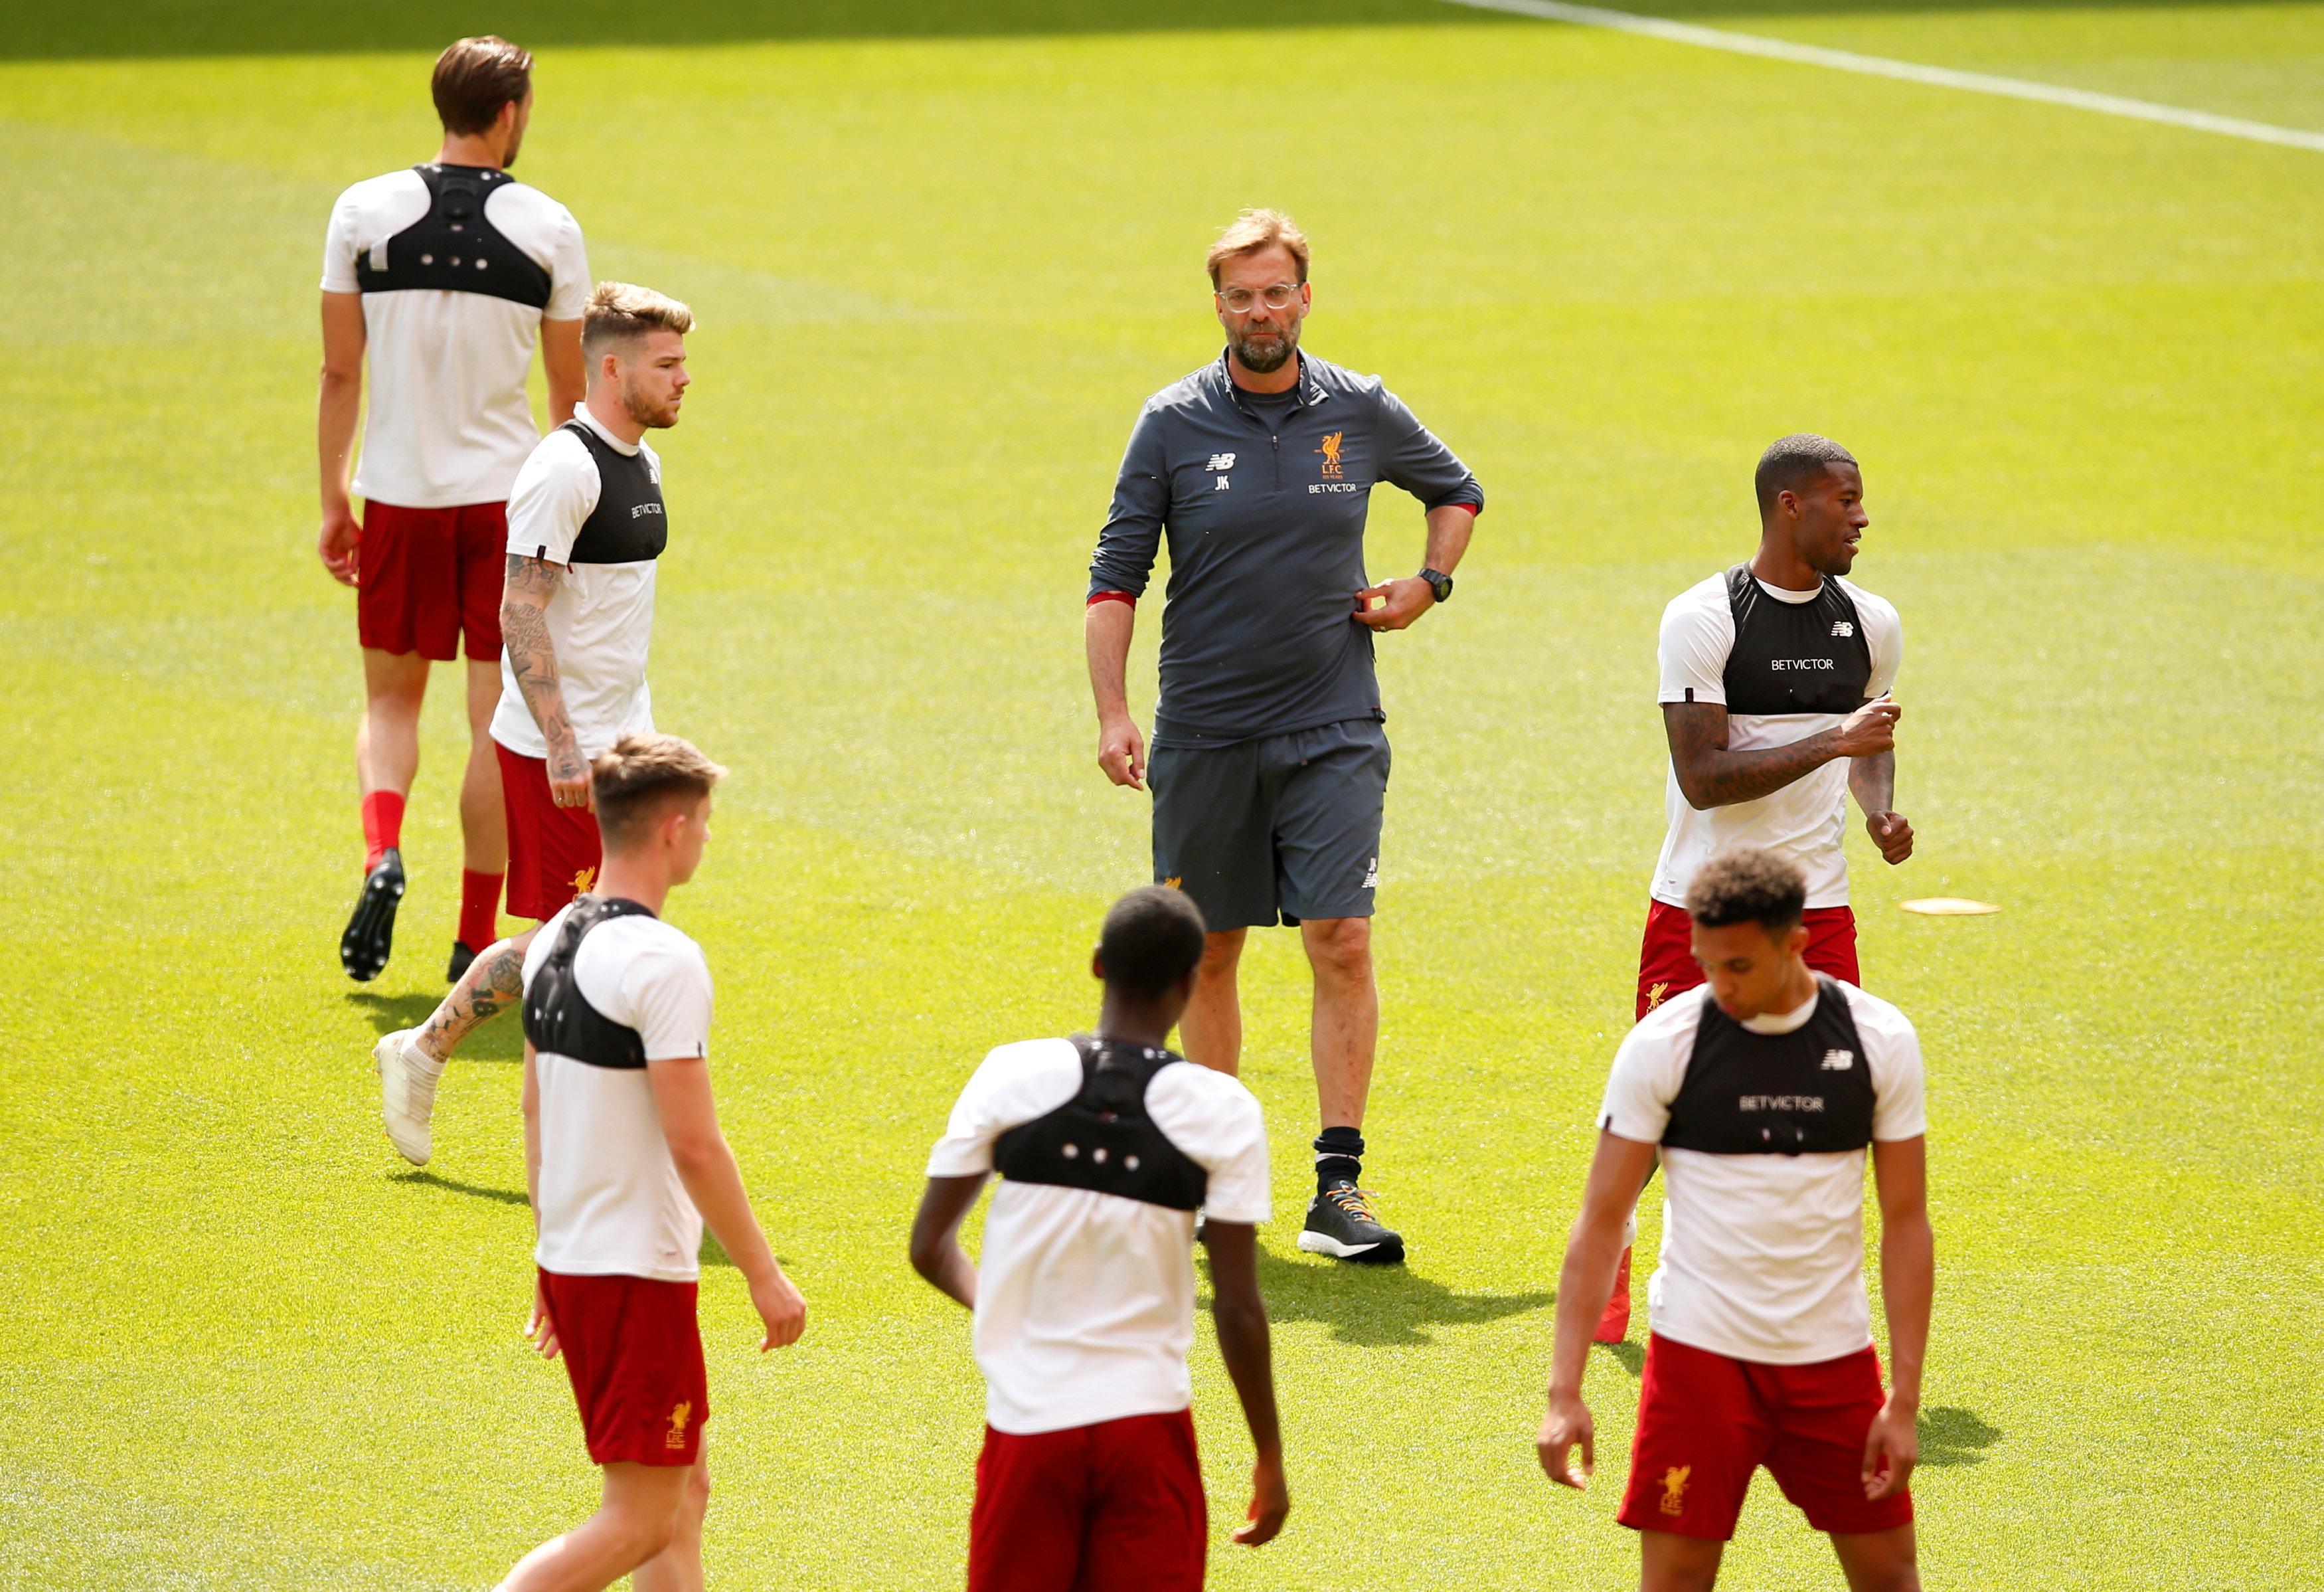 Football: Goals will flow as Klopp's pretenders eye up Real's crown